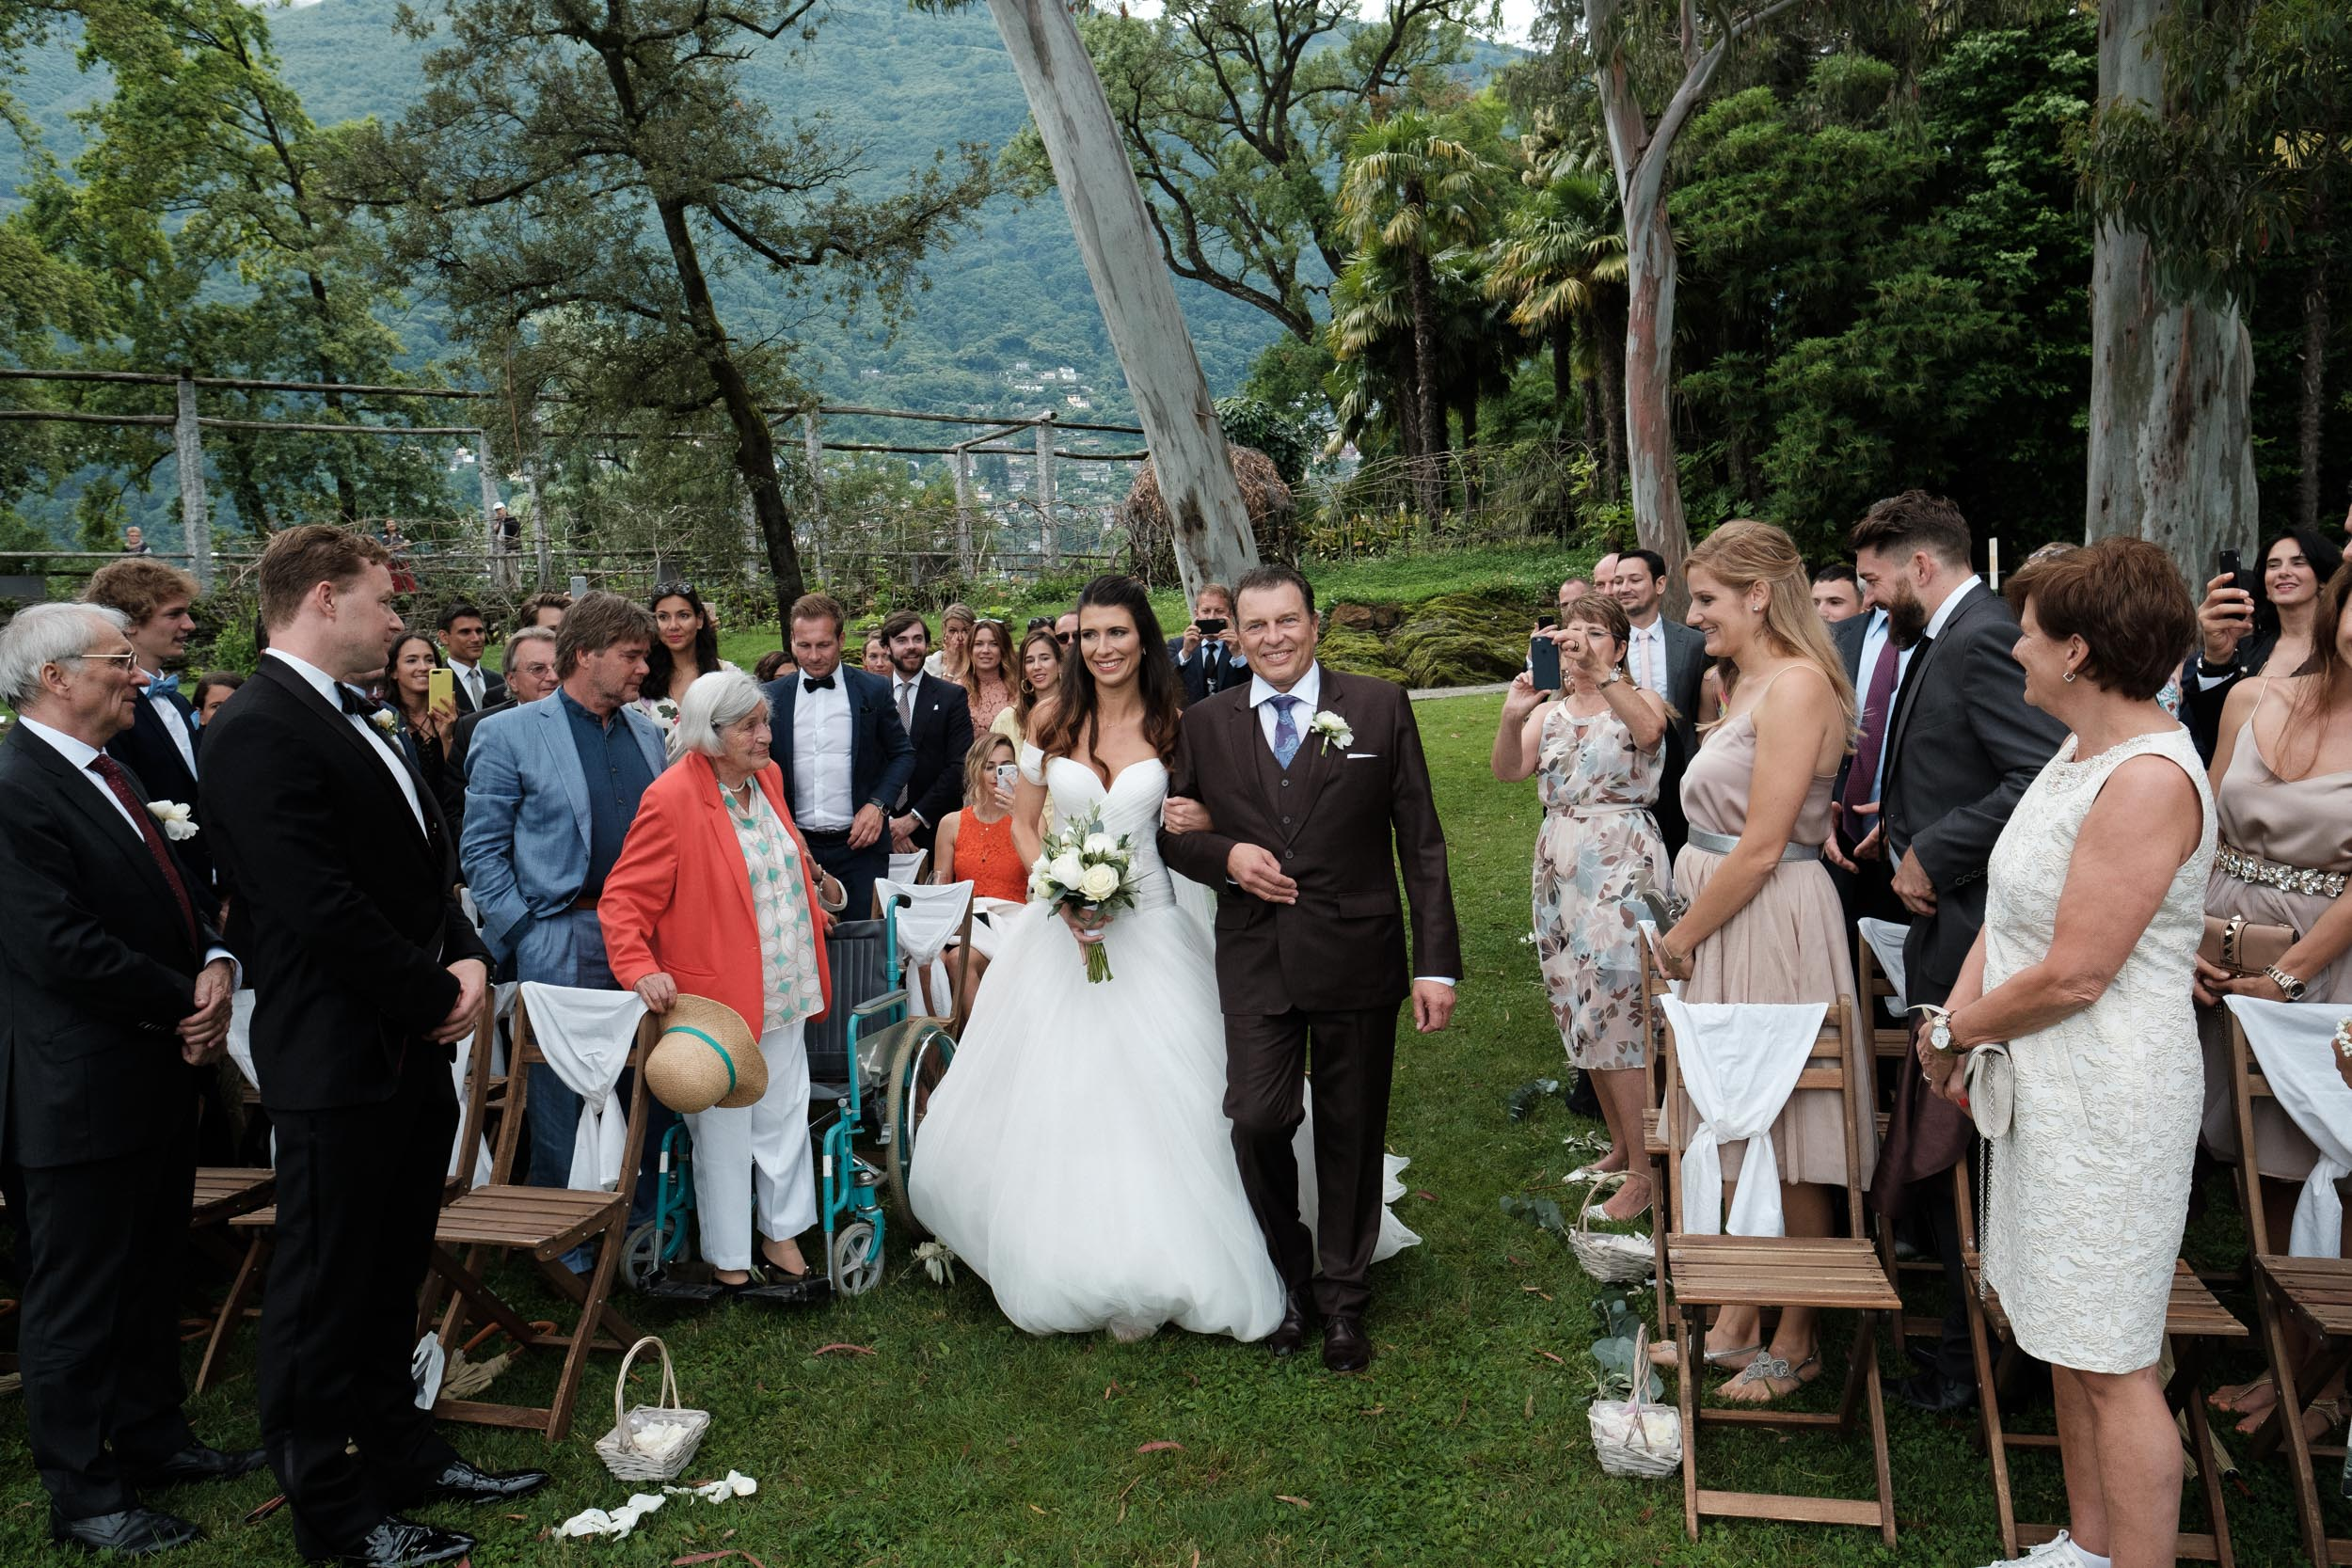 olivia-andreas-wedding-switzerland-290.jpg